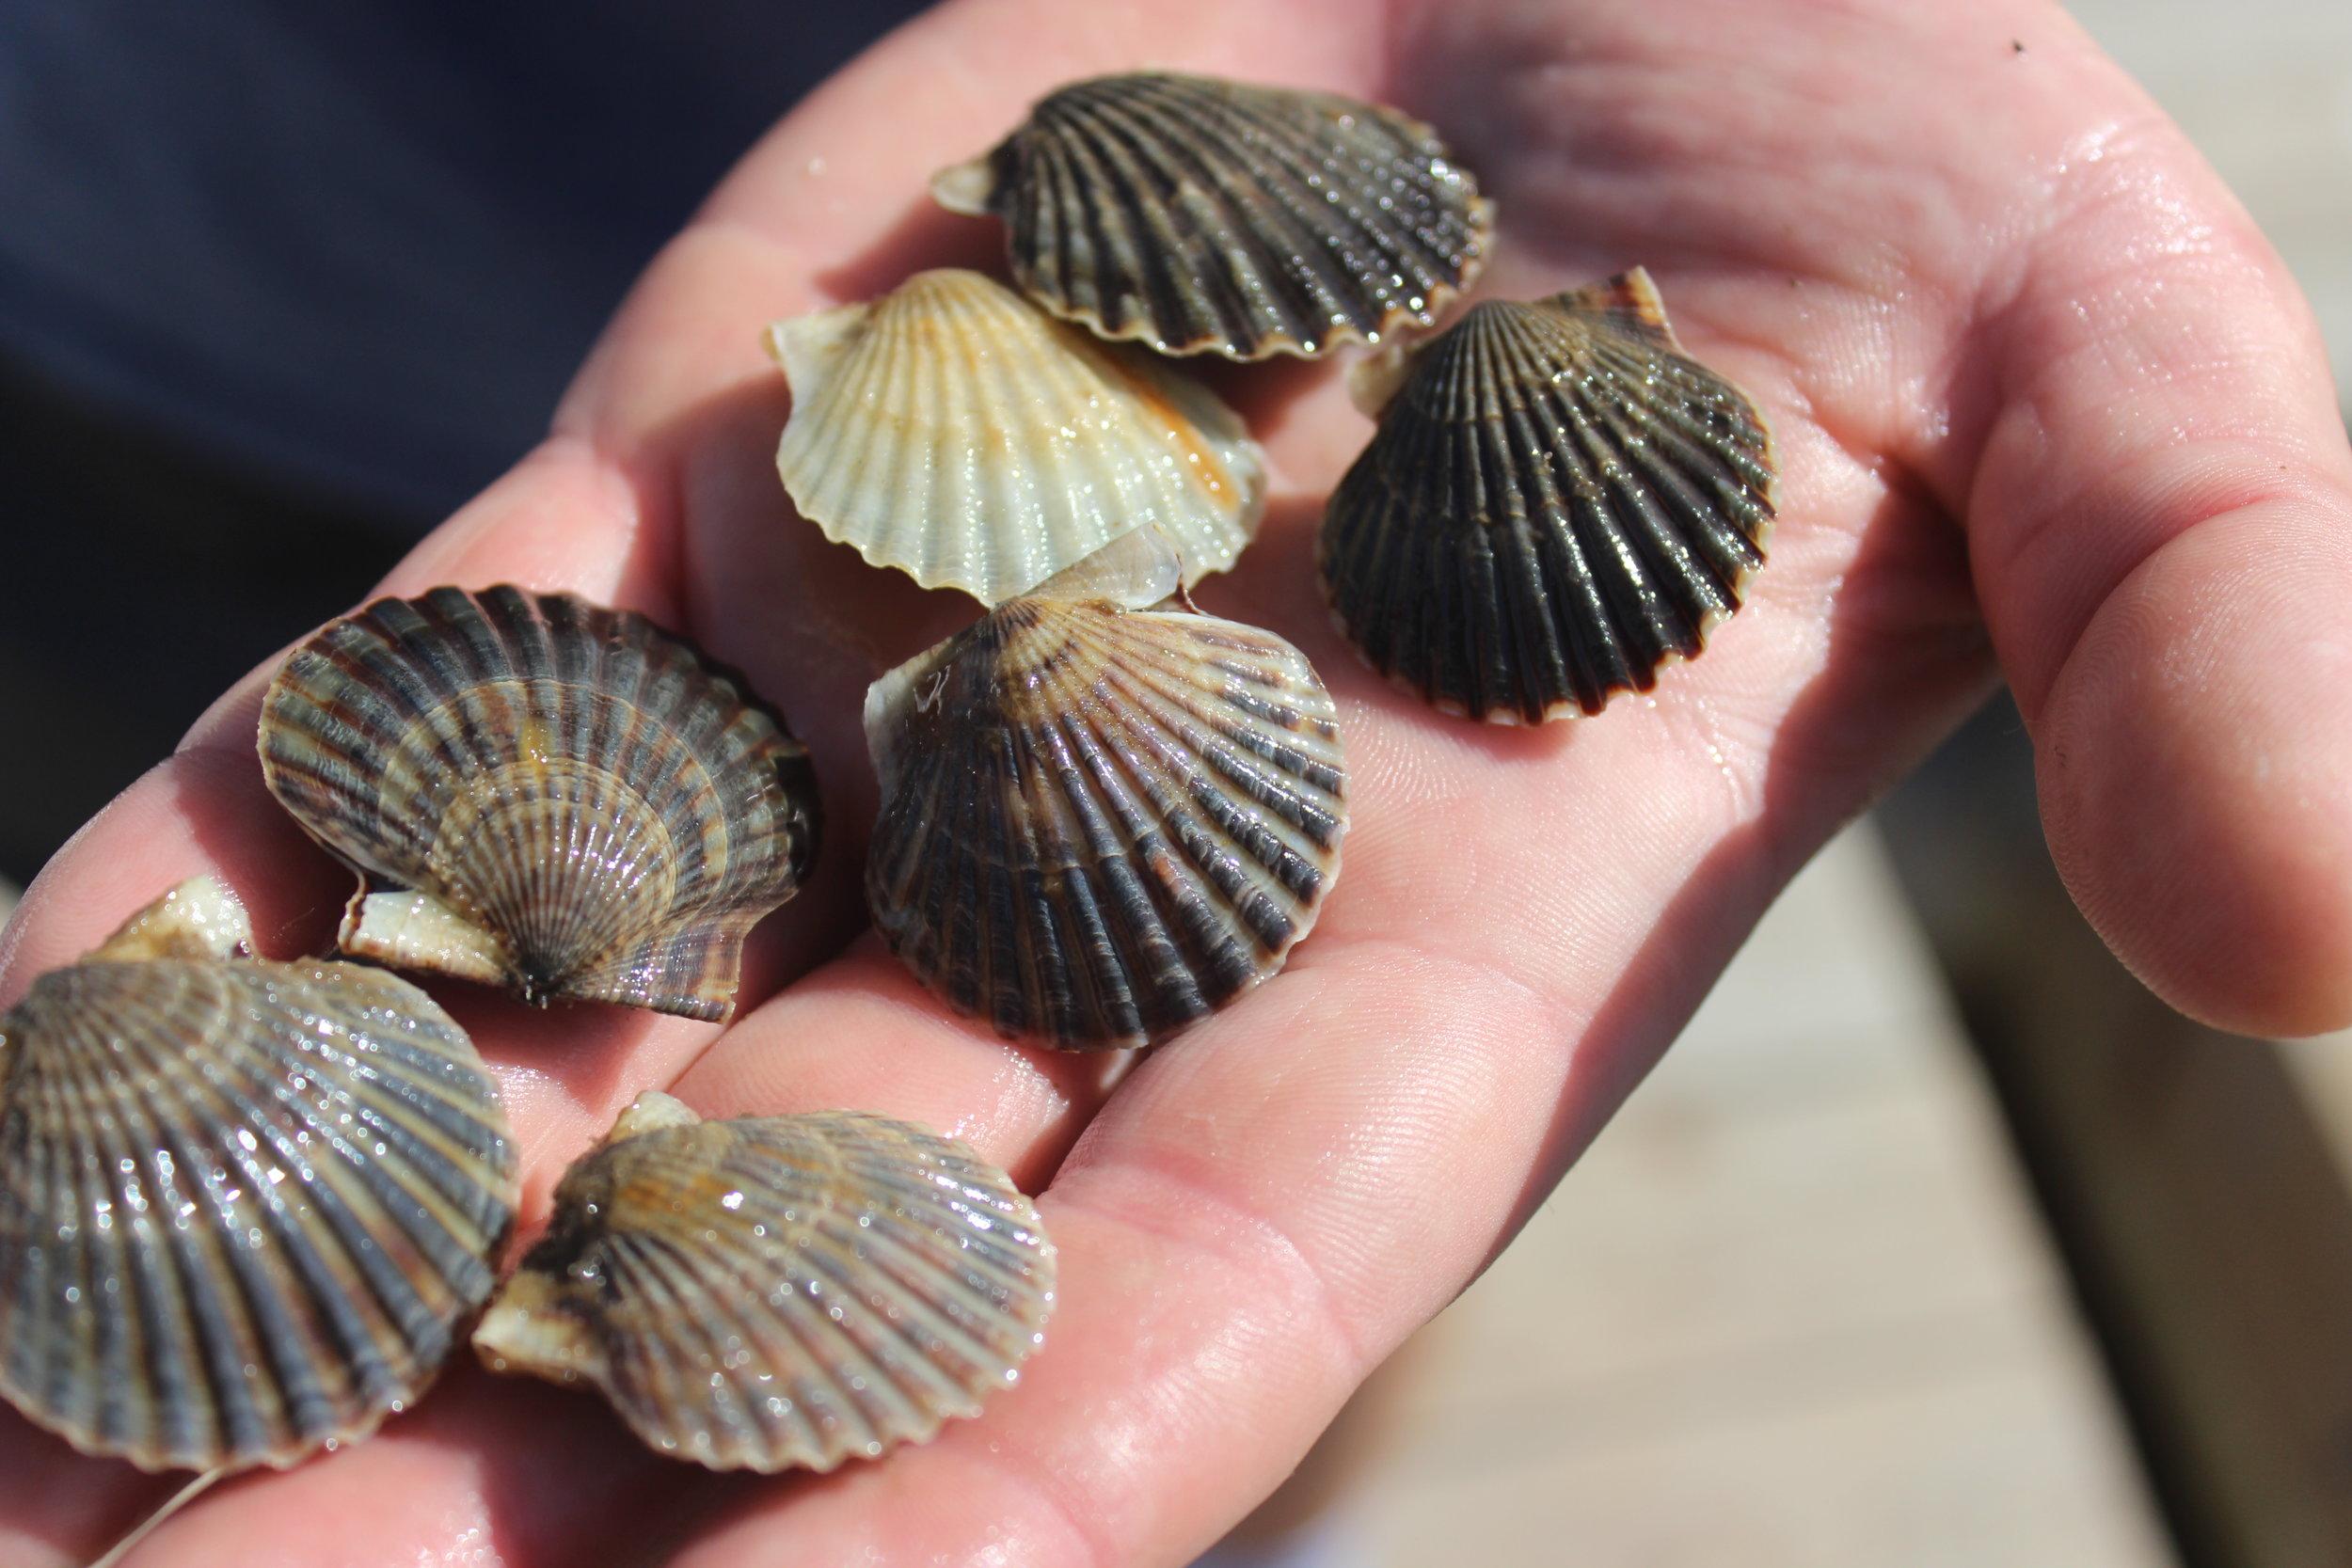 Juvenile bay scallops fresh from the downweller